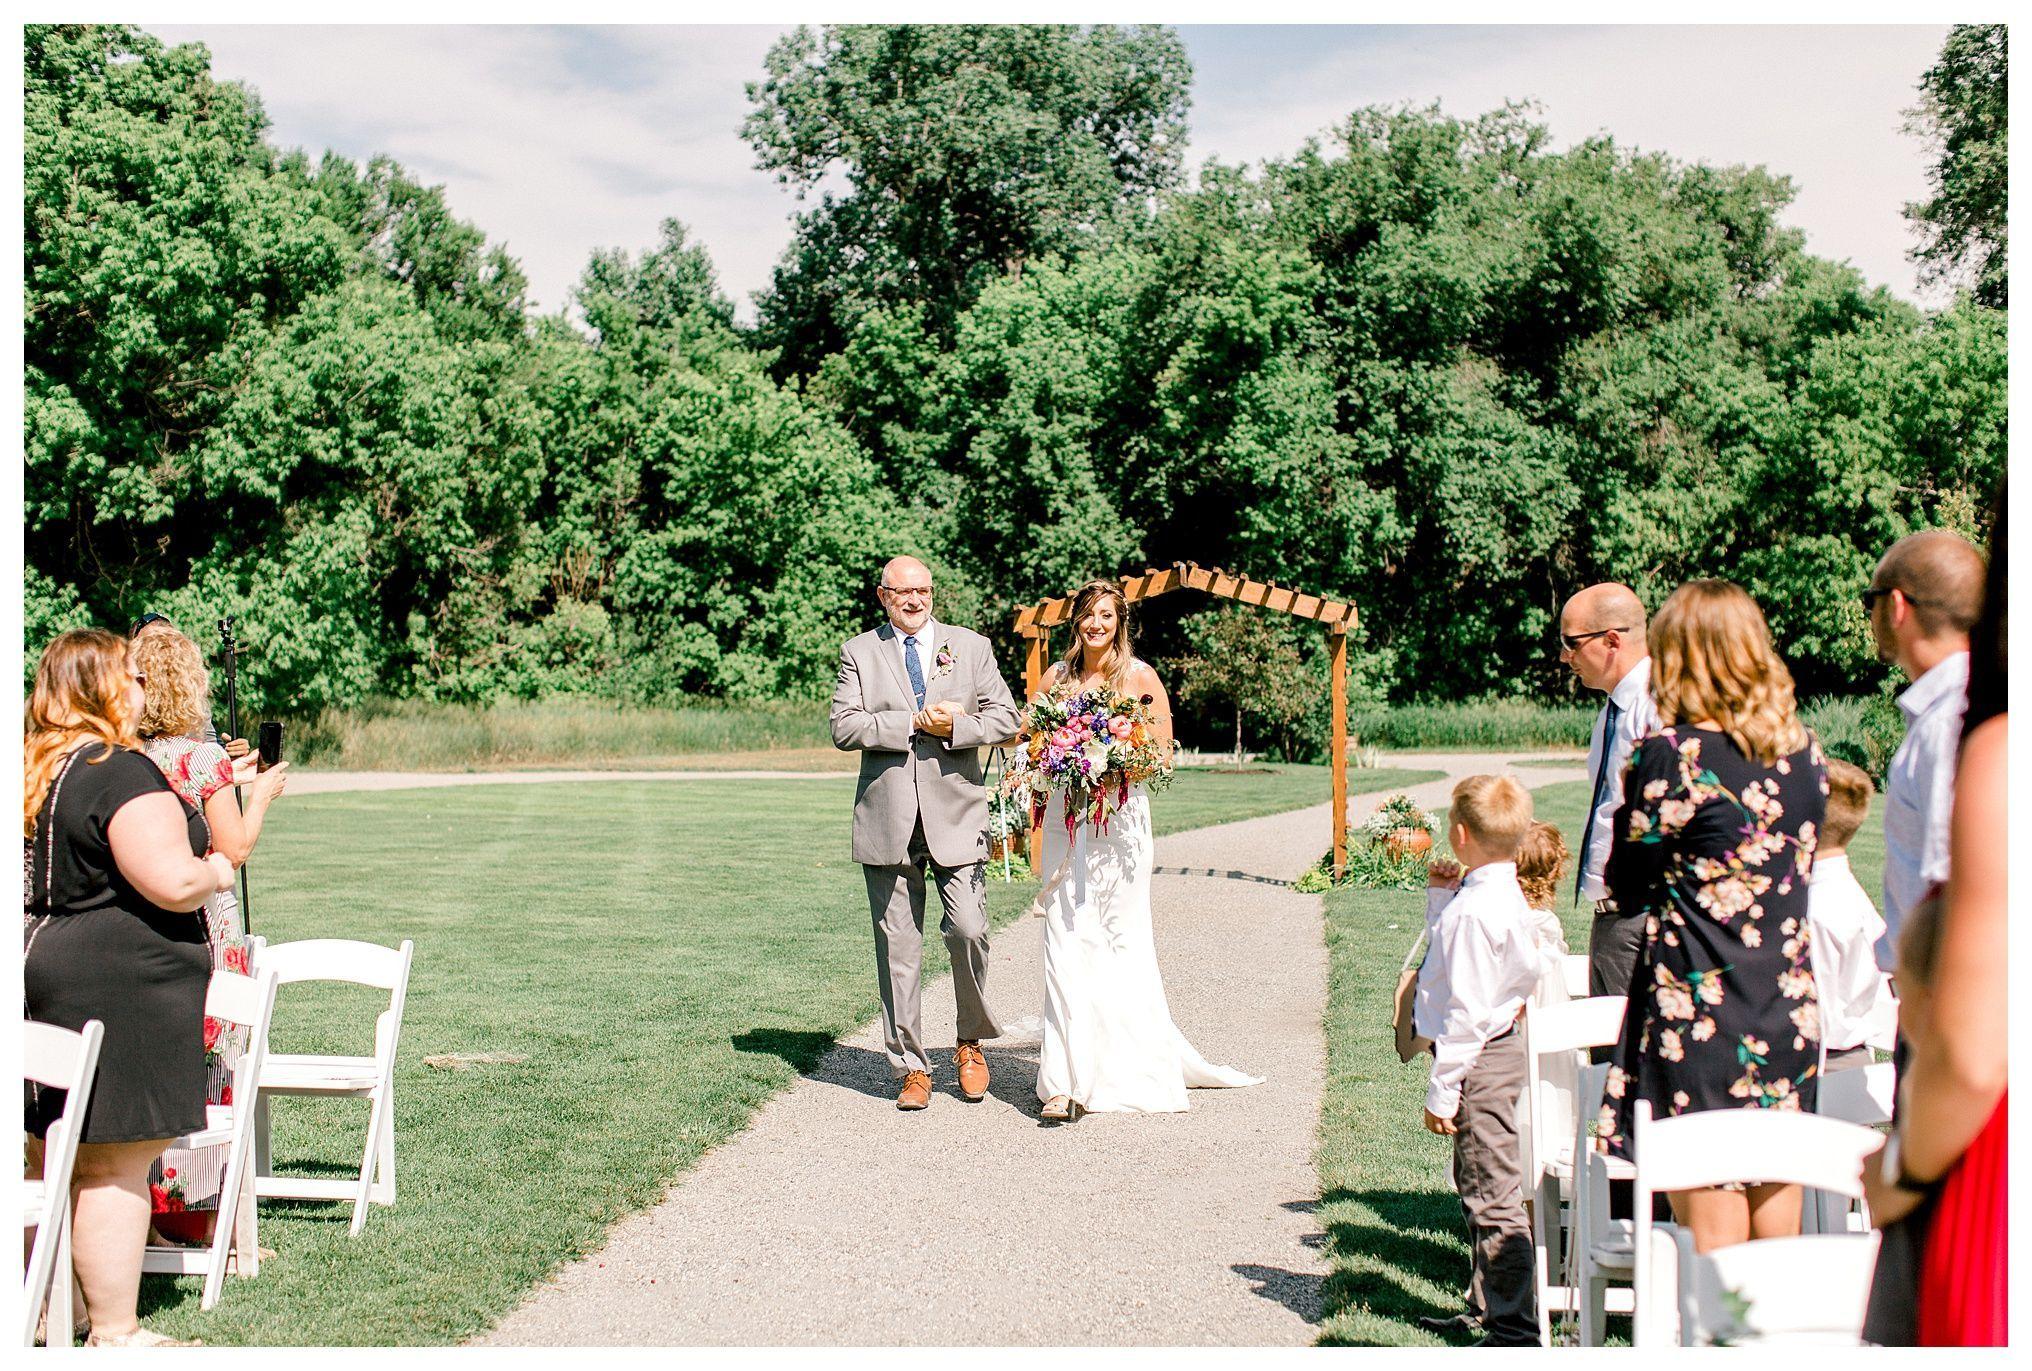 12f2a7fc176b589c8a70390de4ad0056 - Denver Botanic Gardens Chatfield Farms Wedding